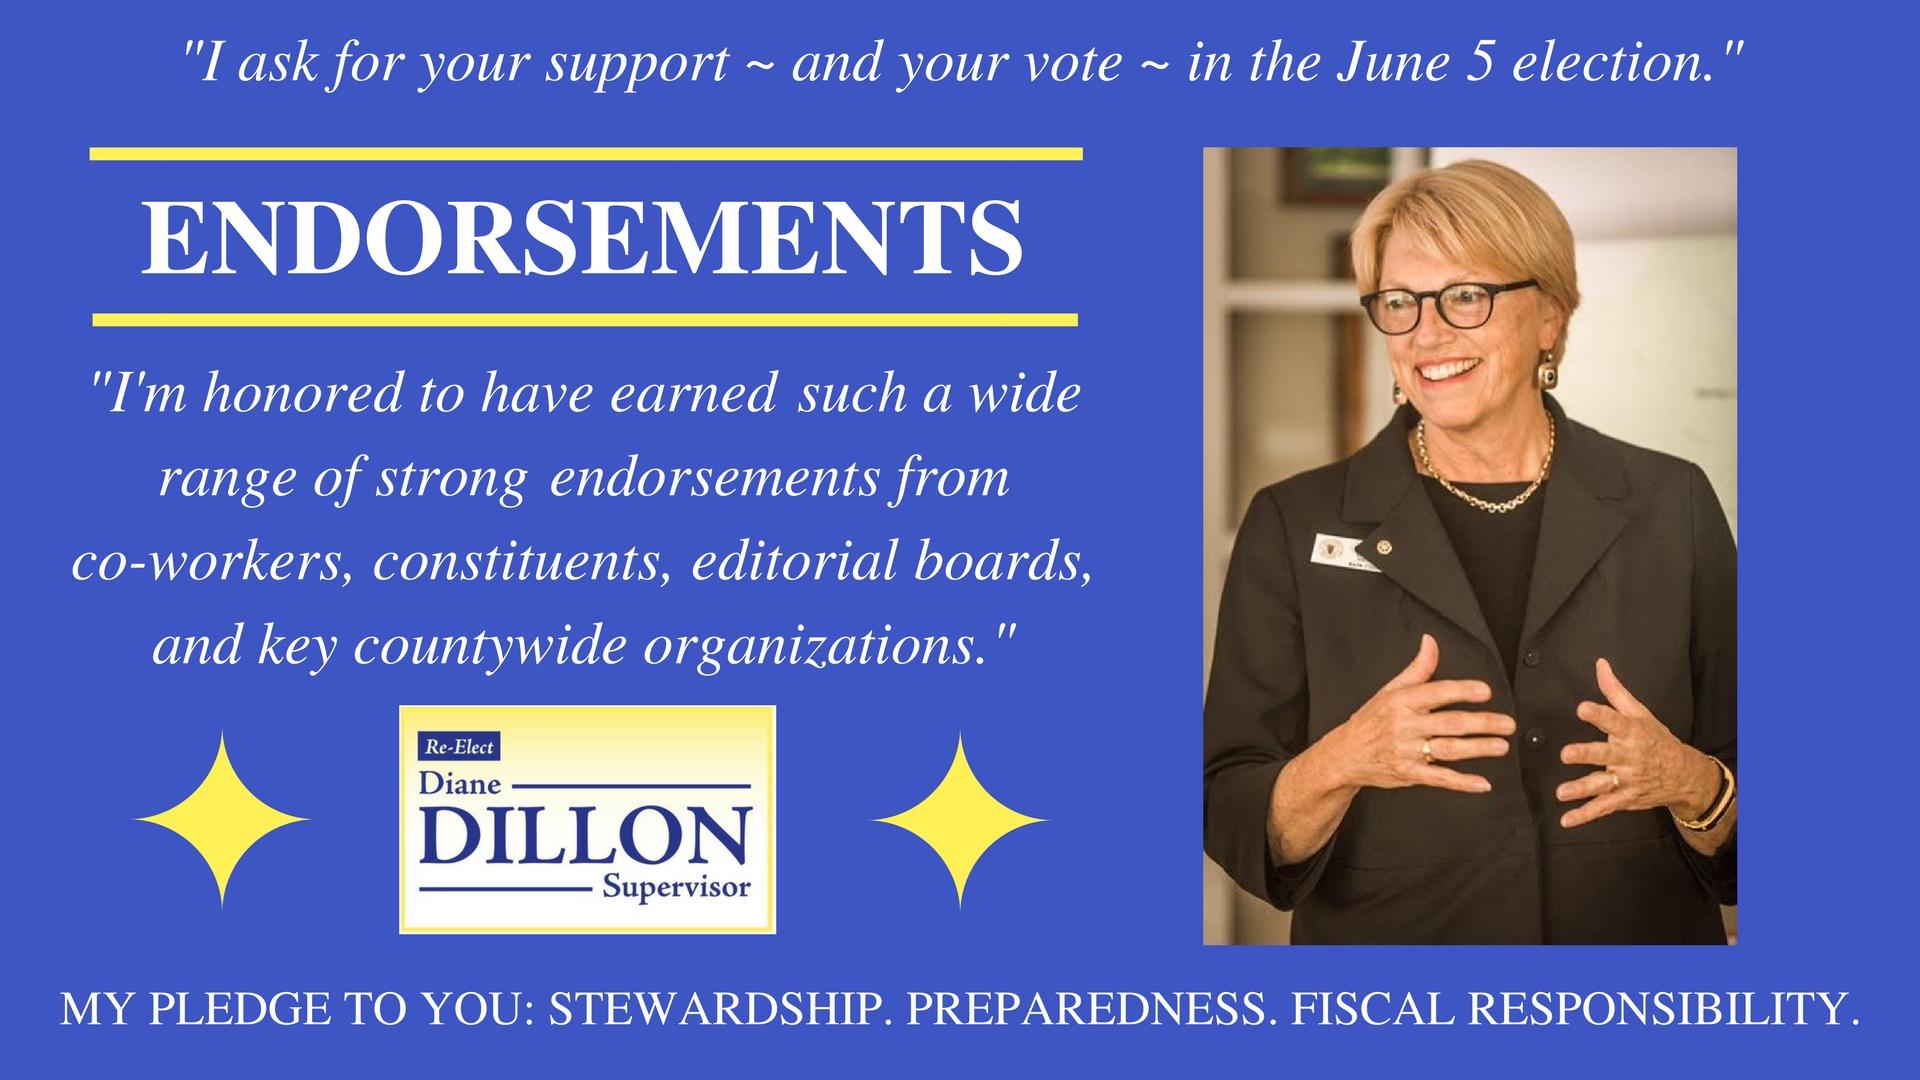 Dillon Endorsements 2018